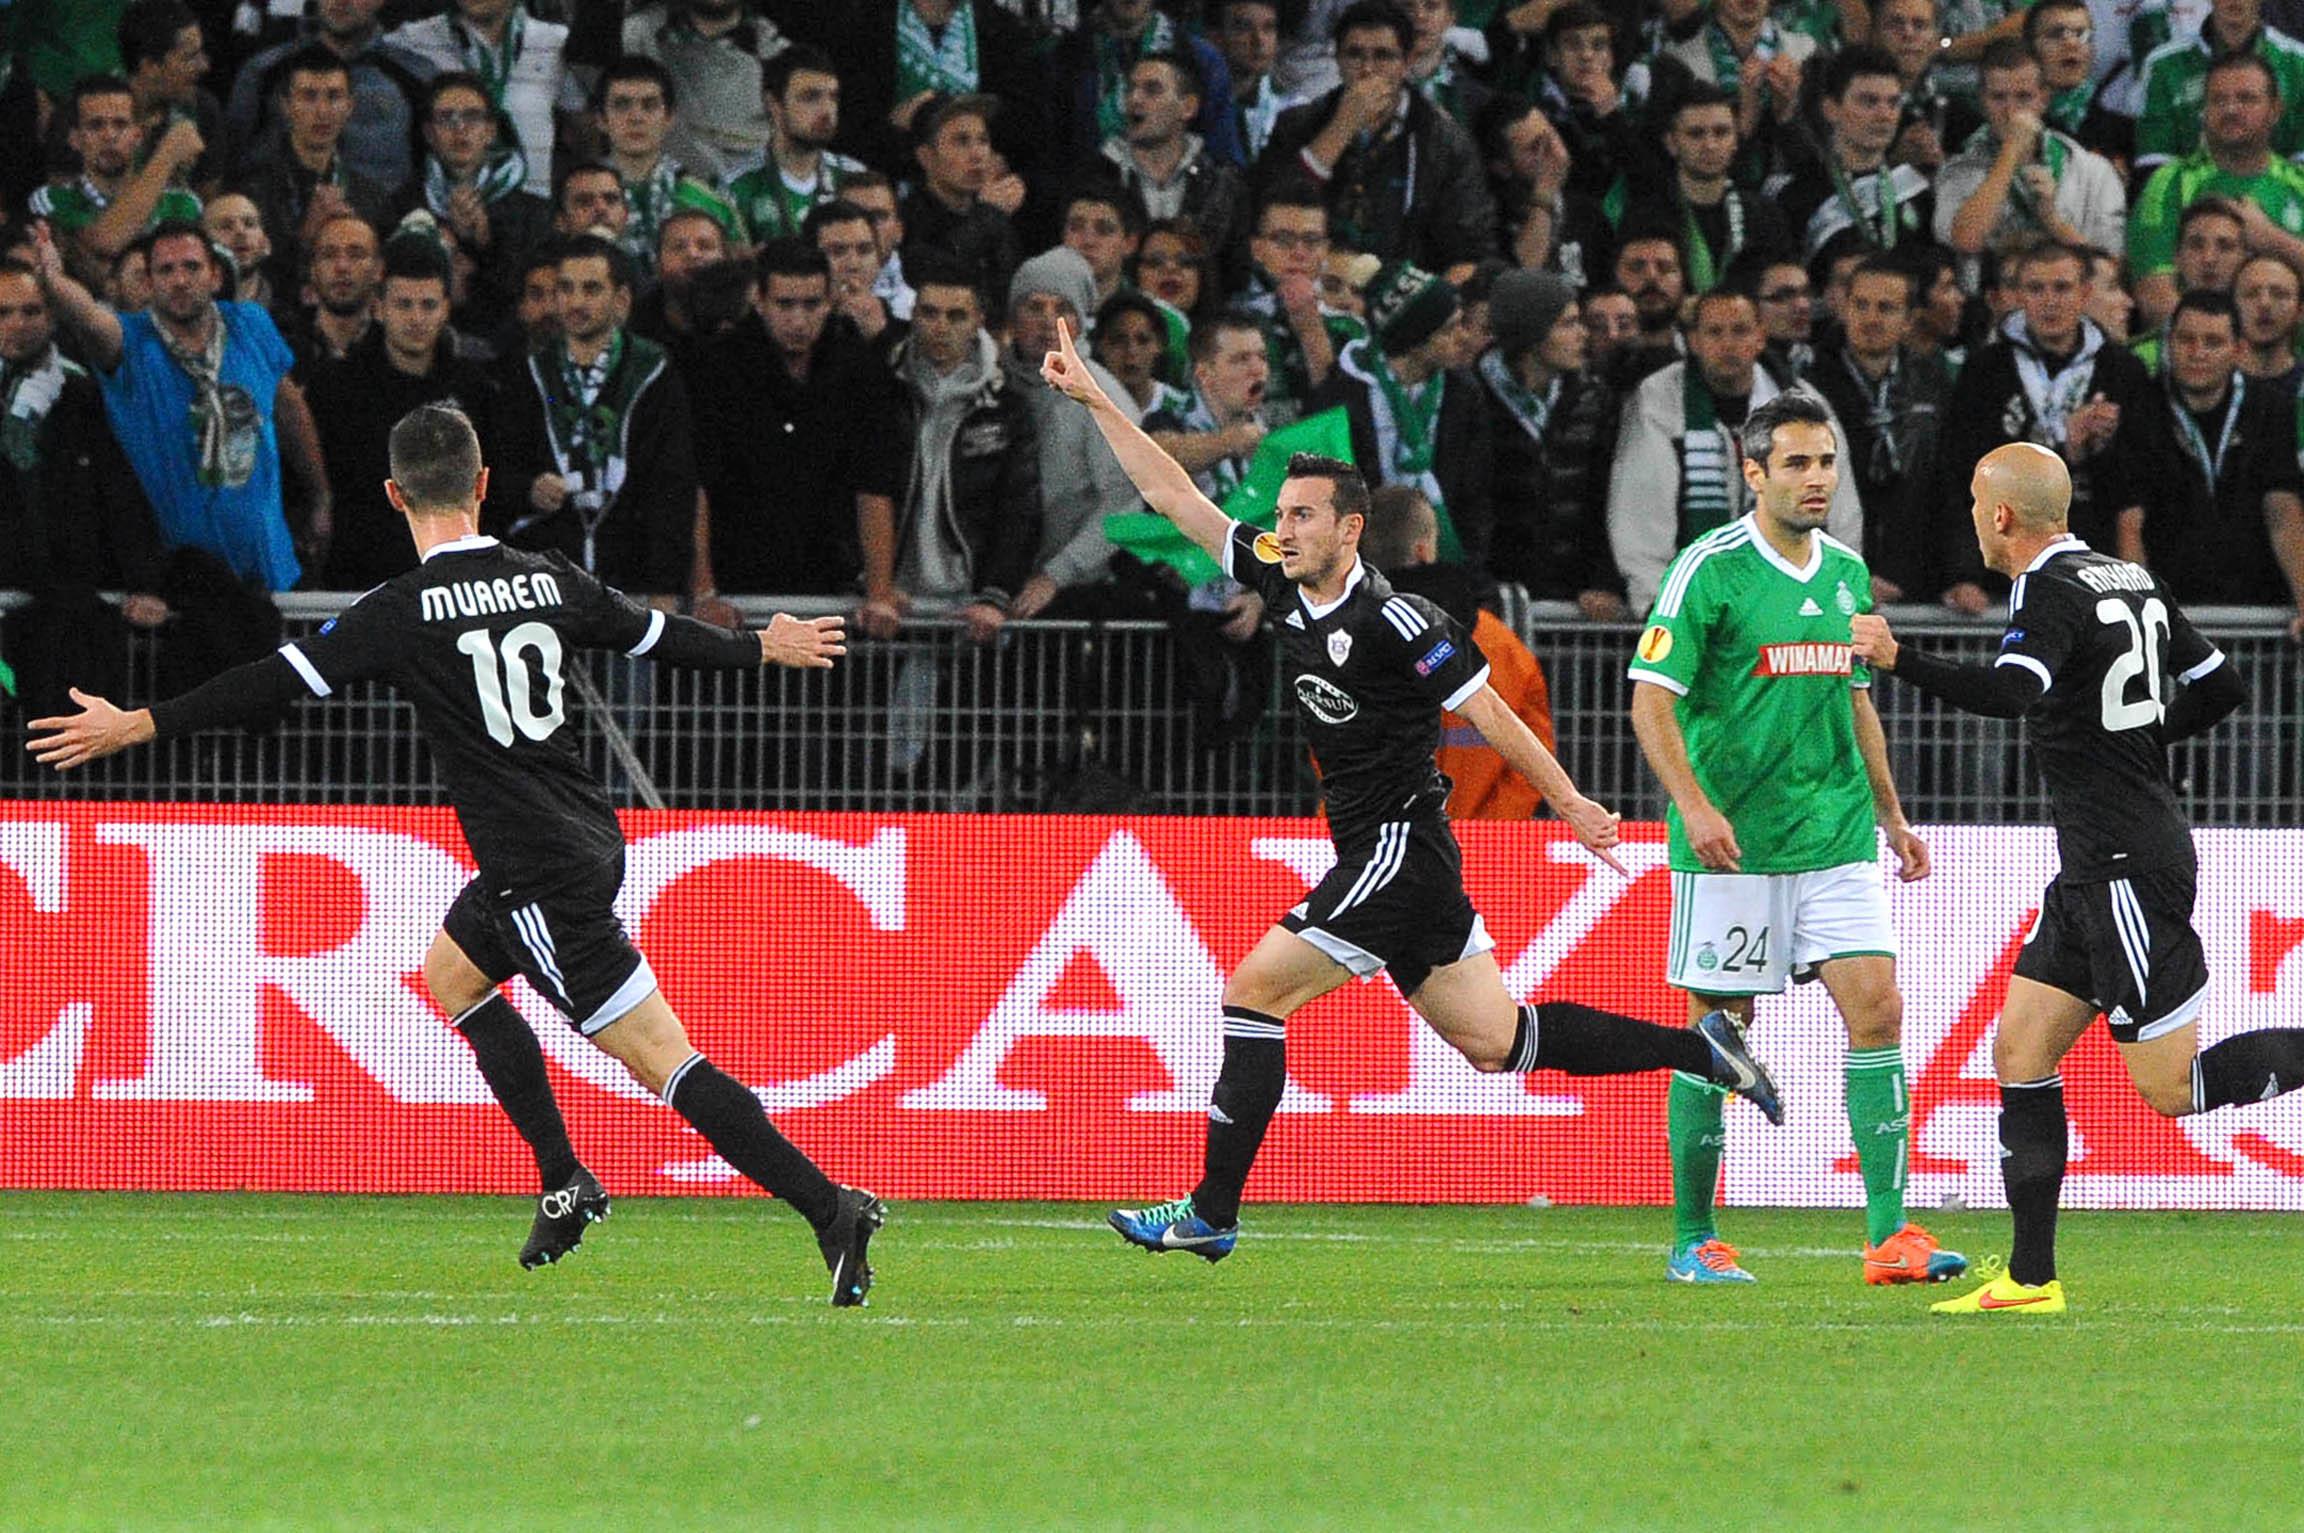 Qarabag FK, « le club des réfugiés » - Le Corner